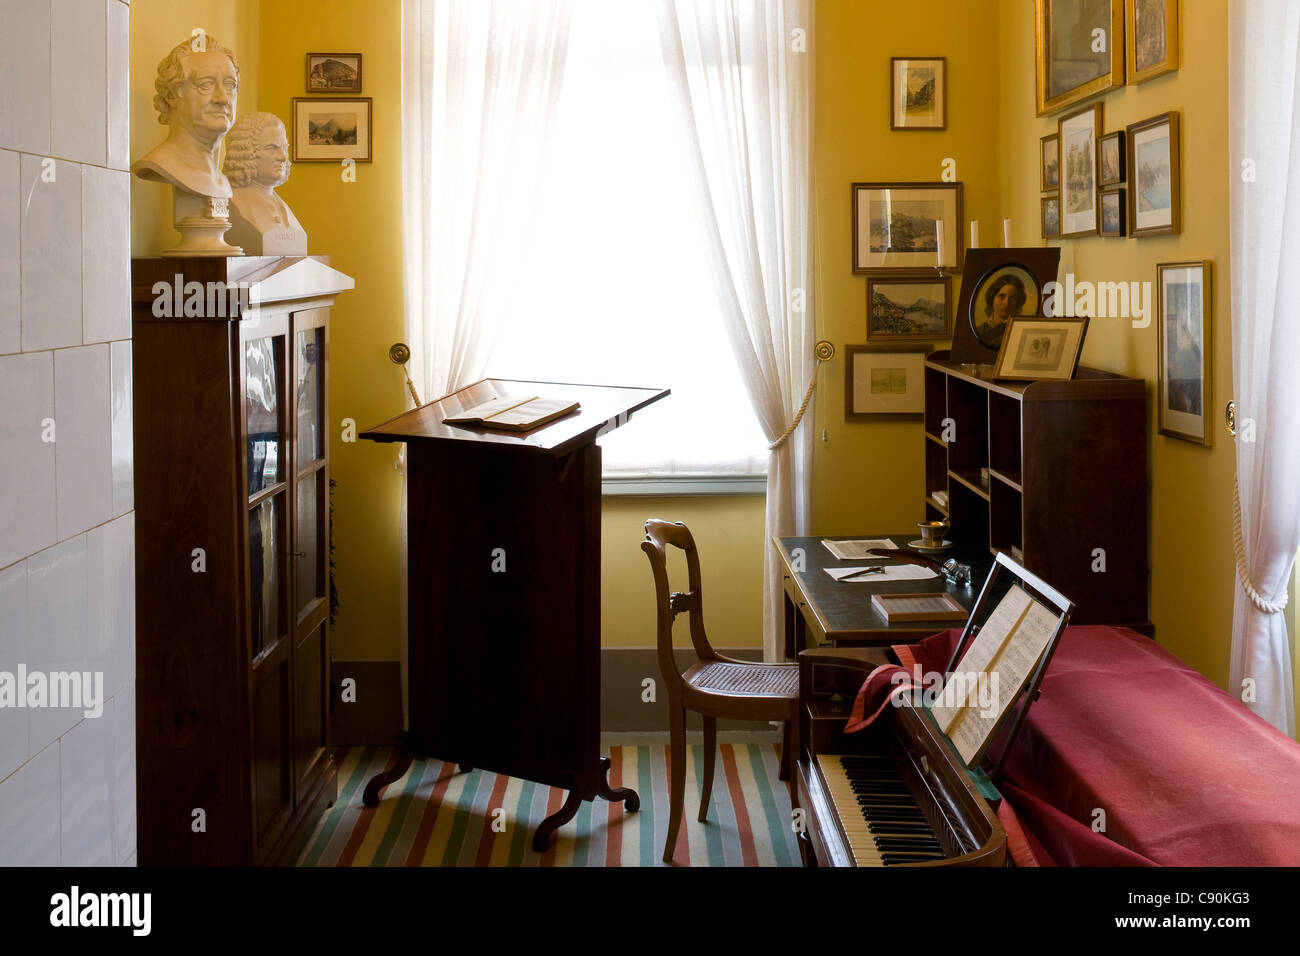 Studieren Sie im Mendelssohn-Haus in Goldschmidtstrasse, Leipzig, Sachsen, Deutschland, Europa Stockbild